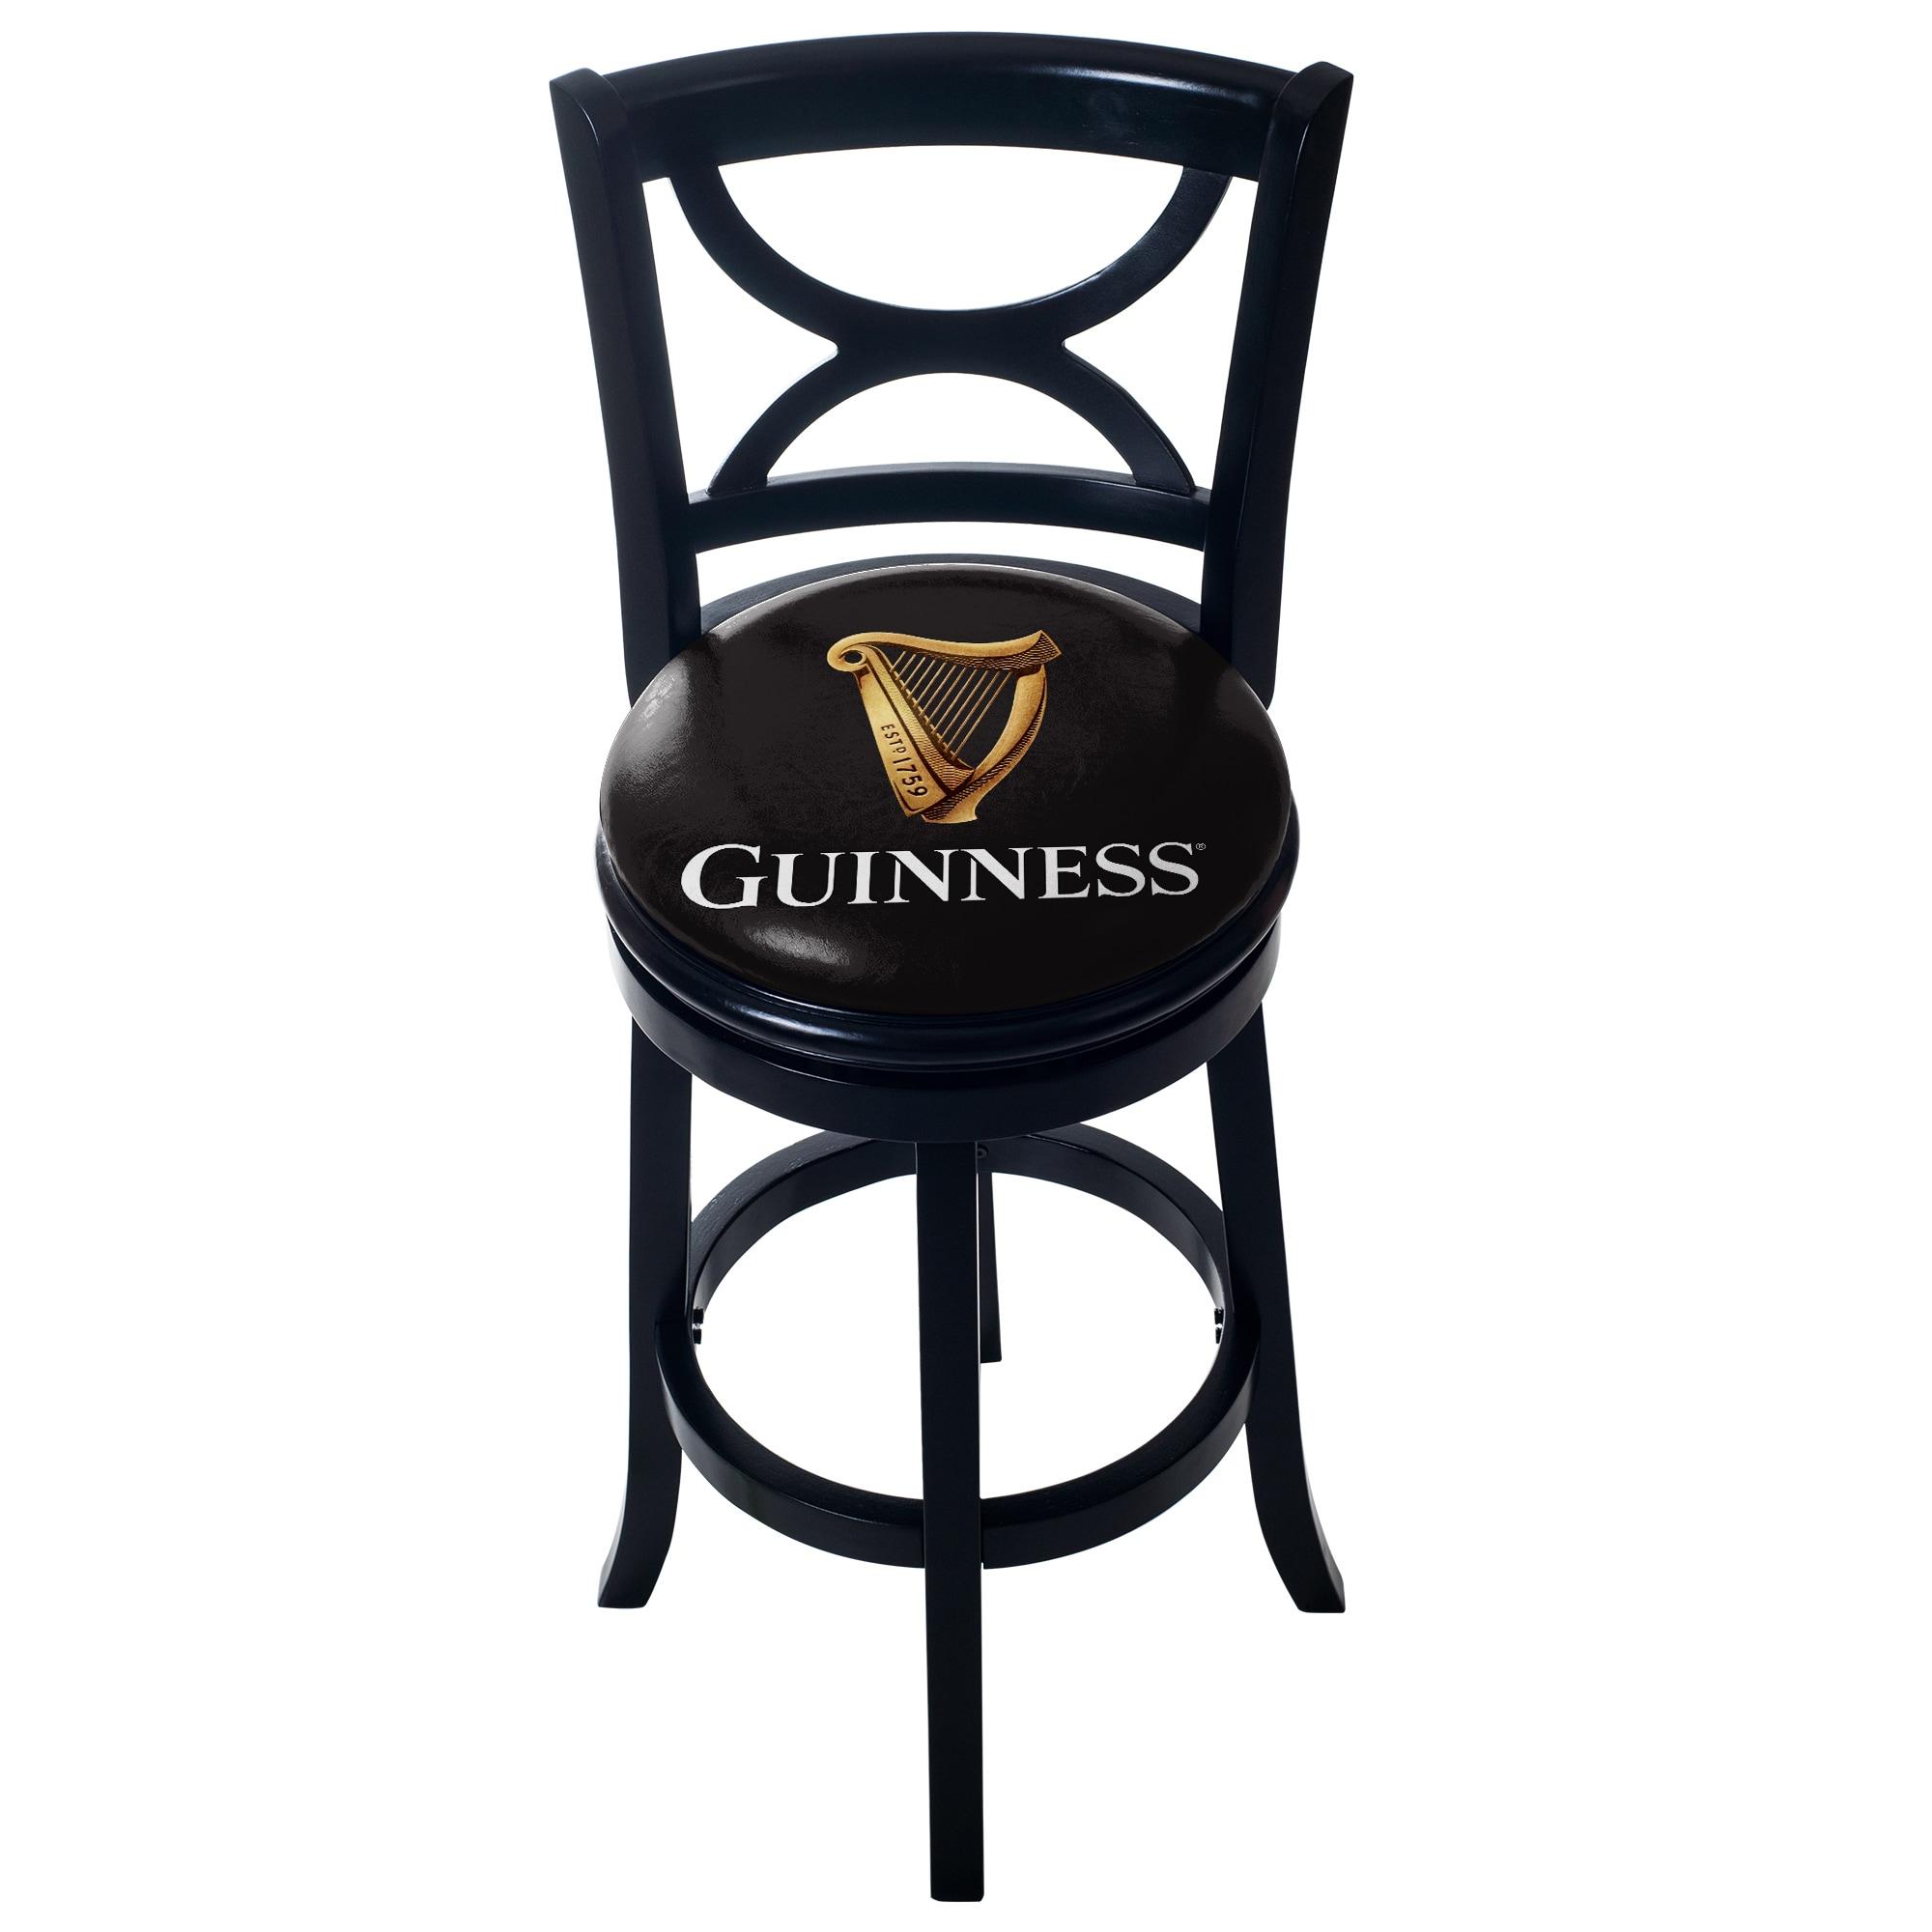 Surprising Guinness Swivel Wood Bar Stool With Back Ibusinesslaw Wood Chair Design Ideas Ibusinesslaworg